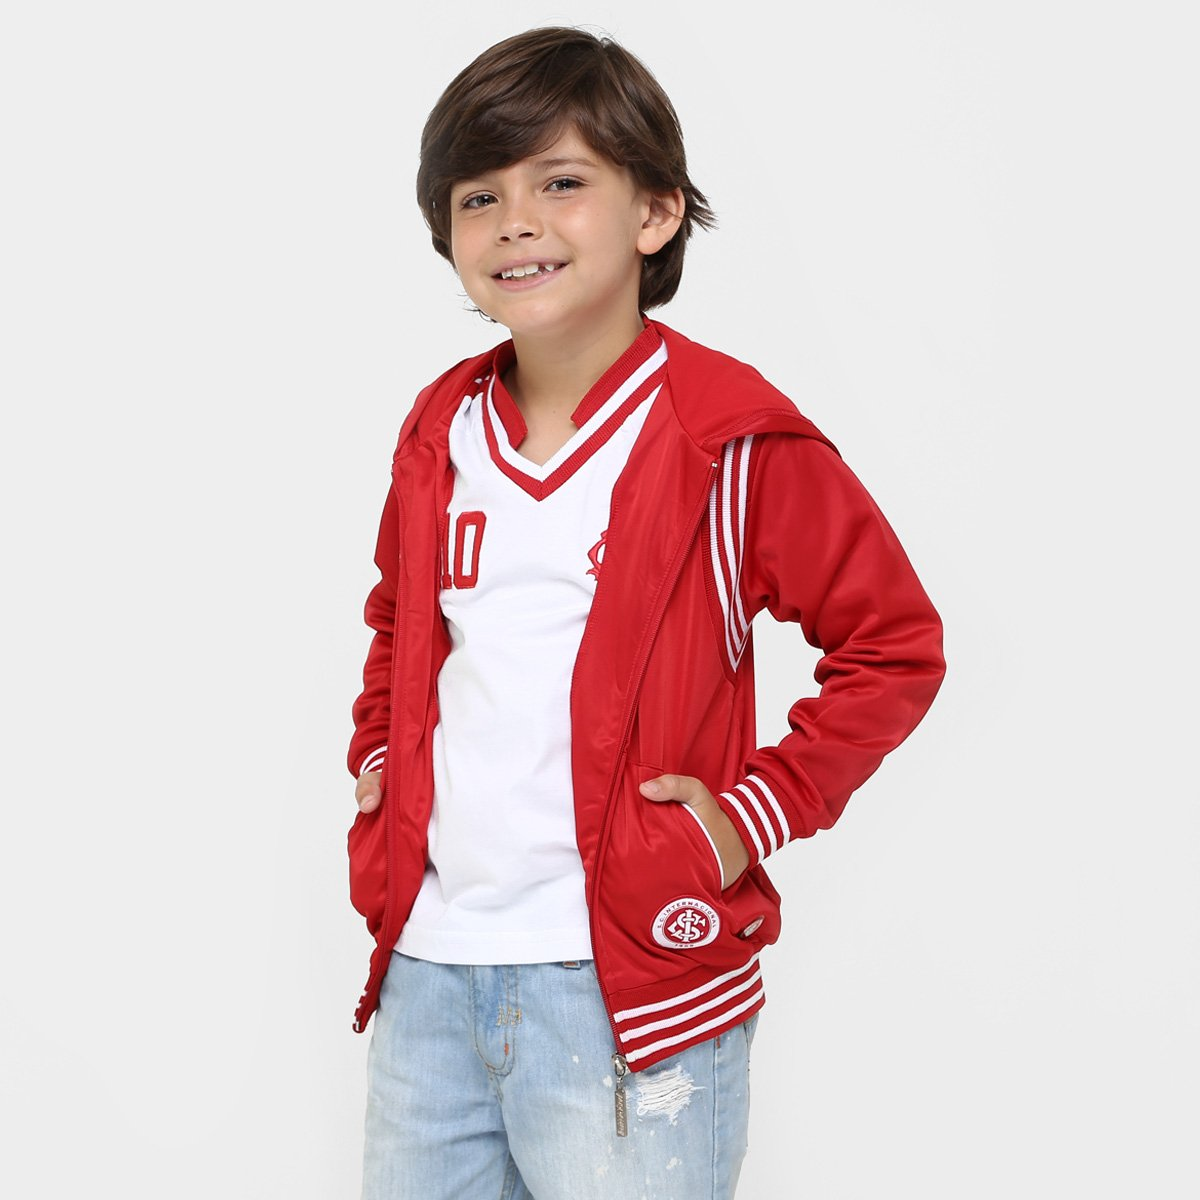 4396416ee5cde Jaqueta Internacional Infantil Trilobal 9 - Compre Agora